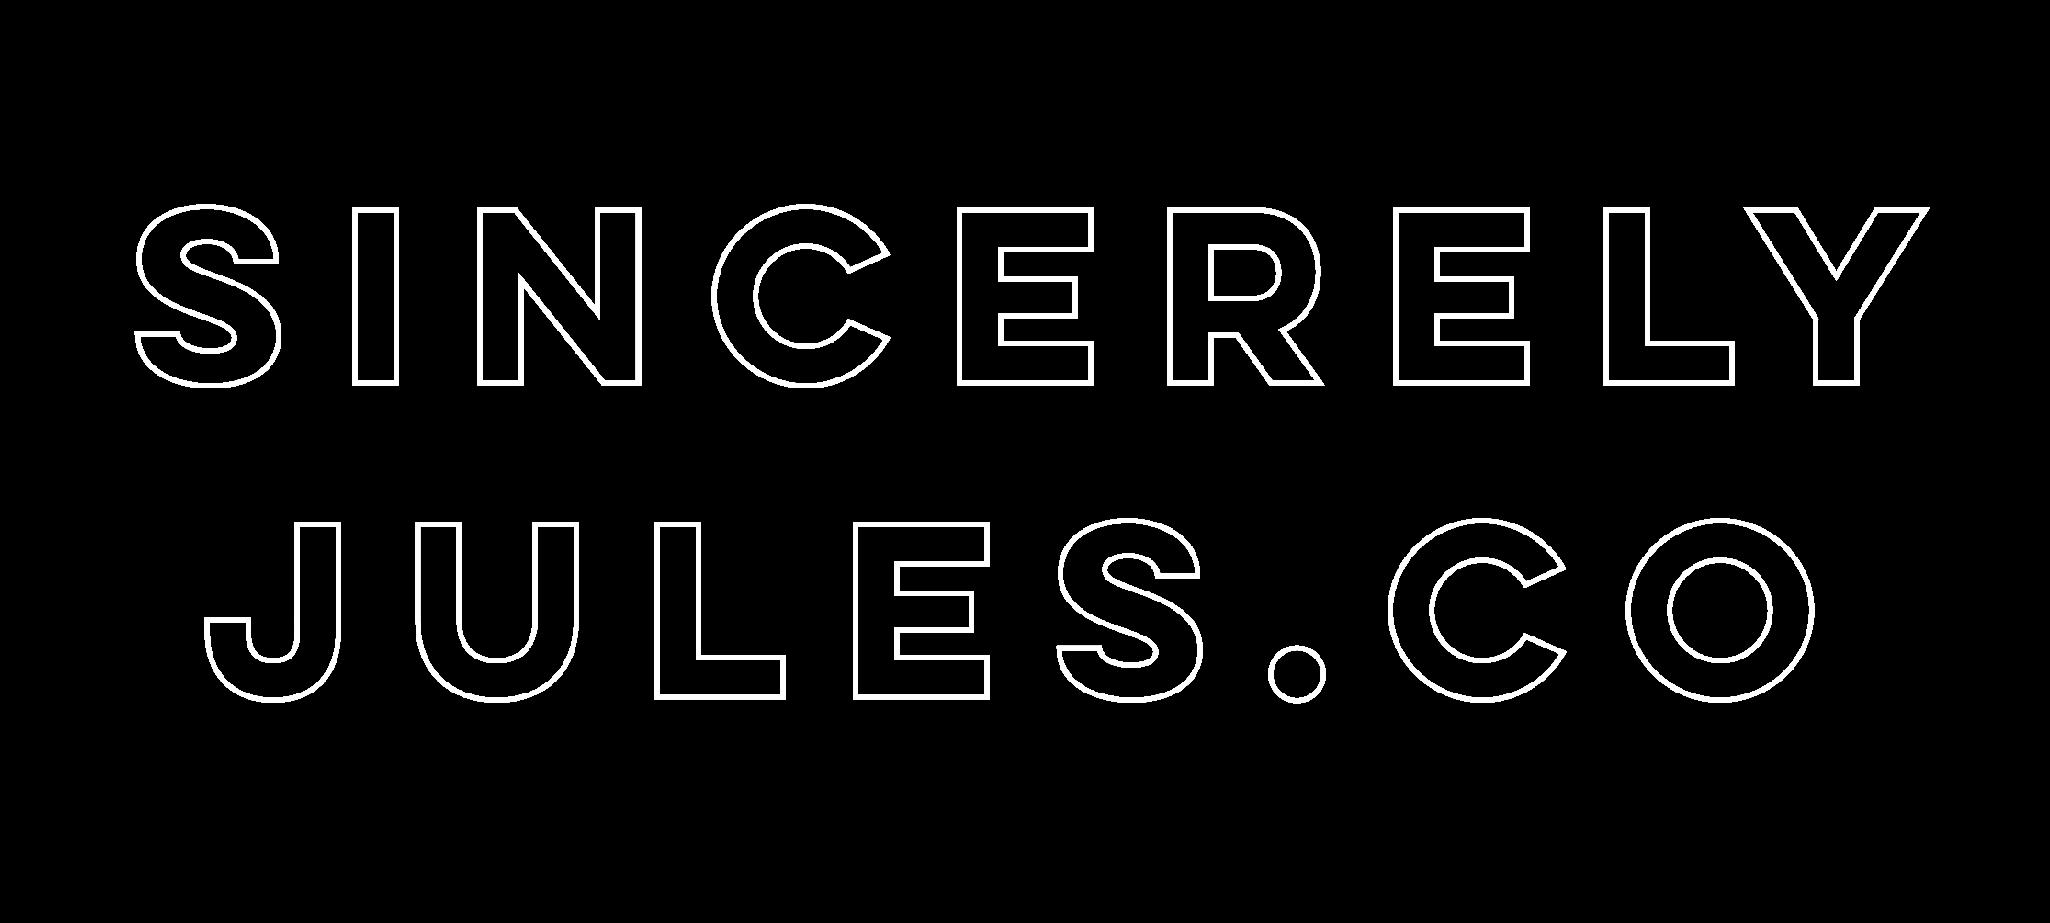 SINCERELYJULES.CO